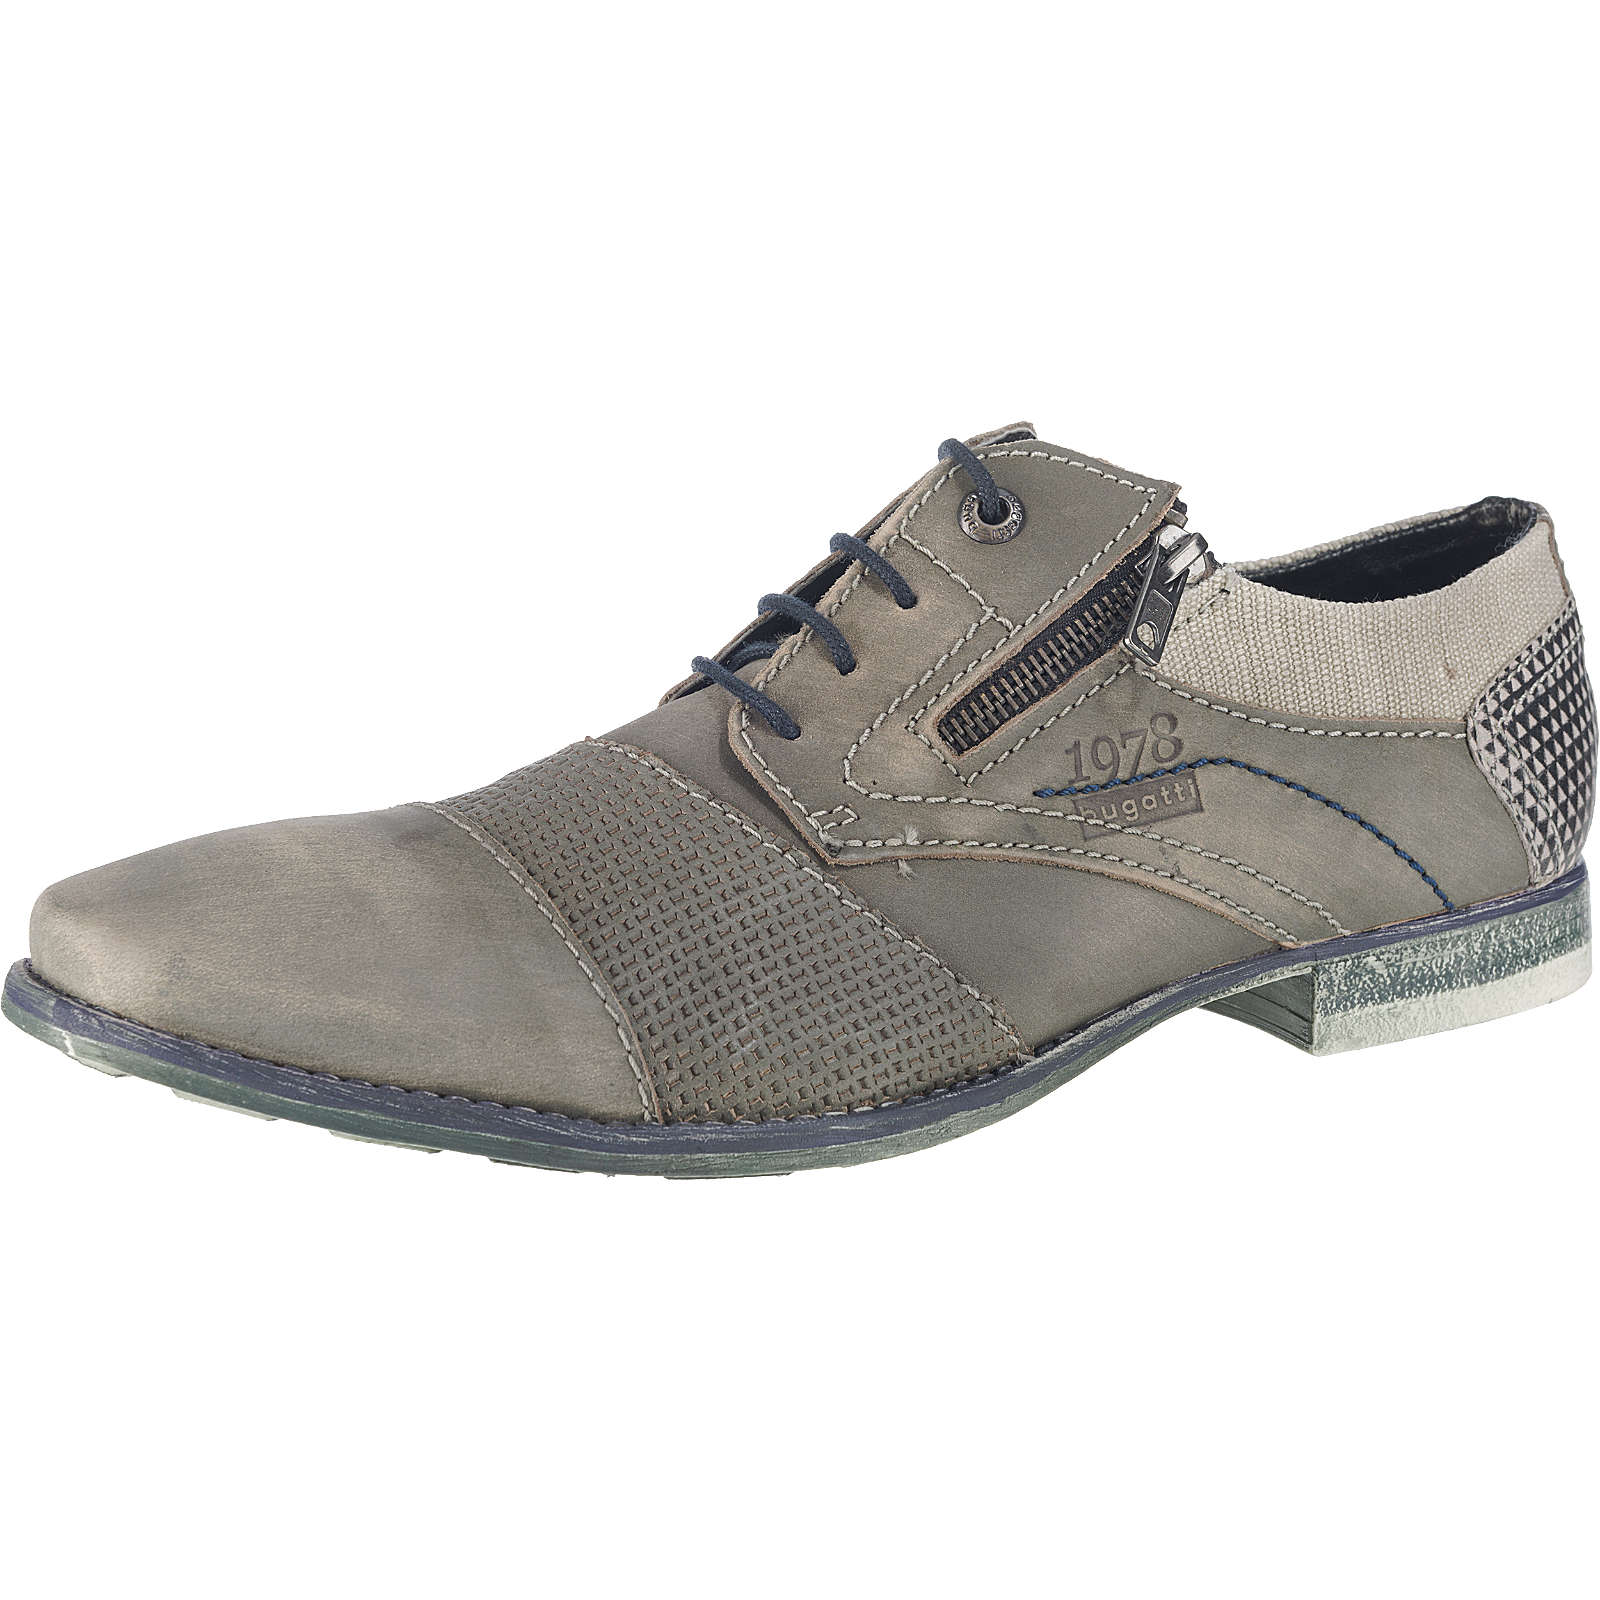 bugatti Freizeit Schuhe grau Herren Gr. 40